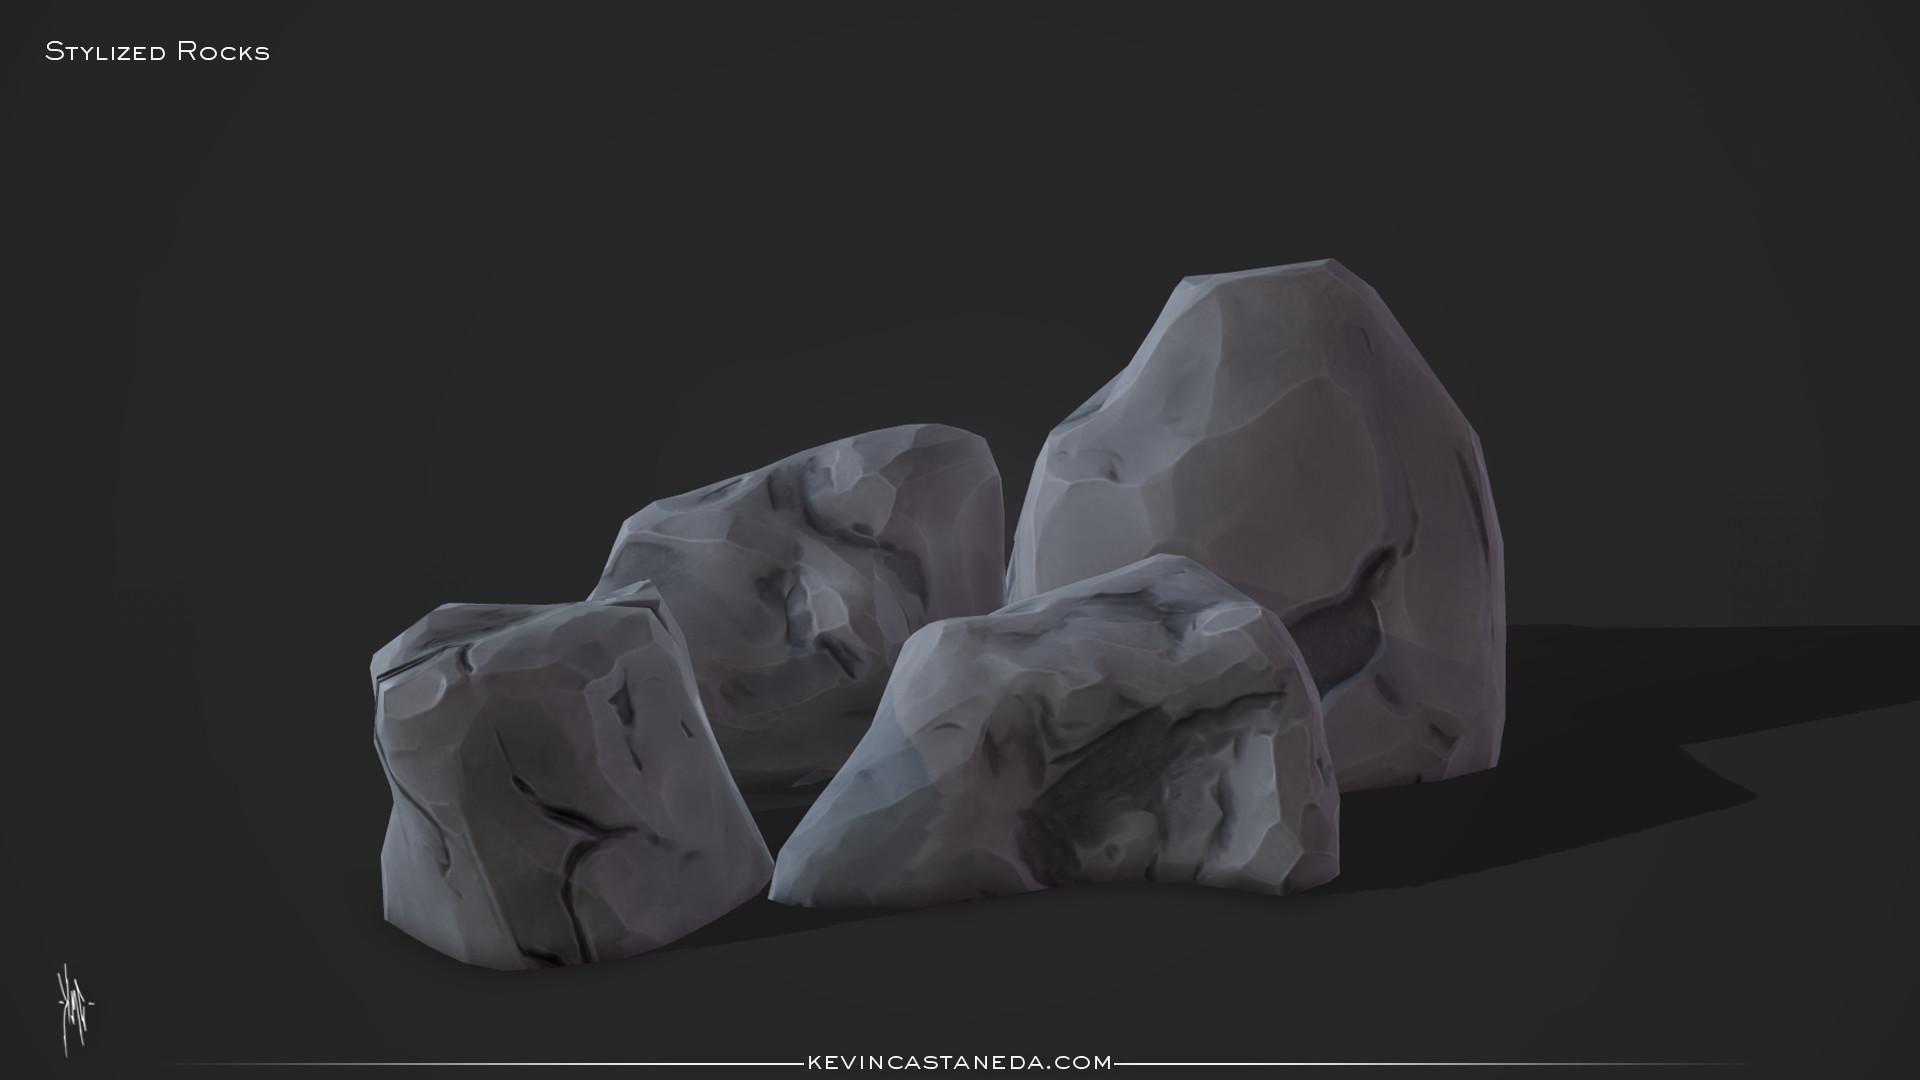 Kevin m castaneda stylized rocks